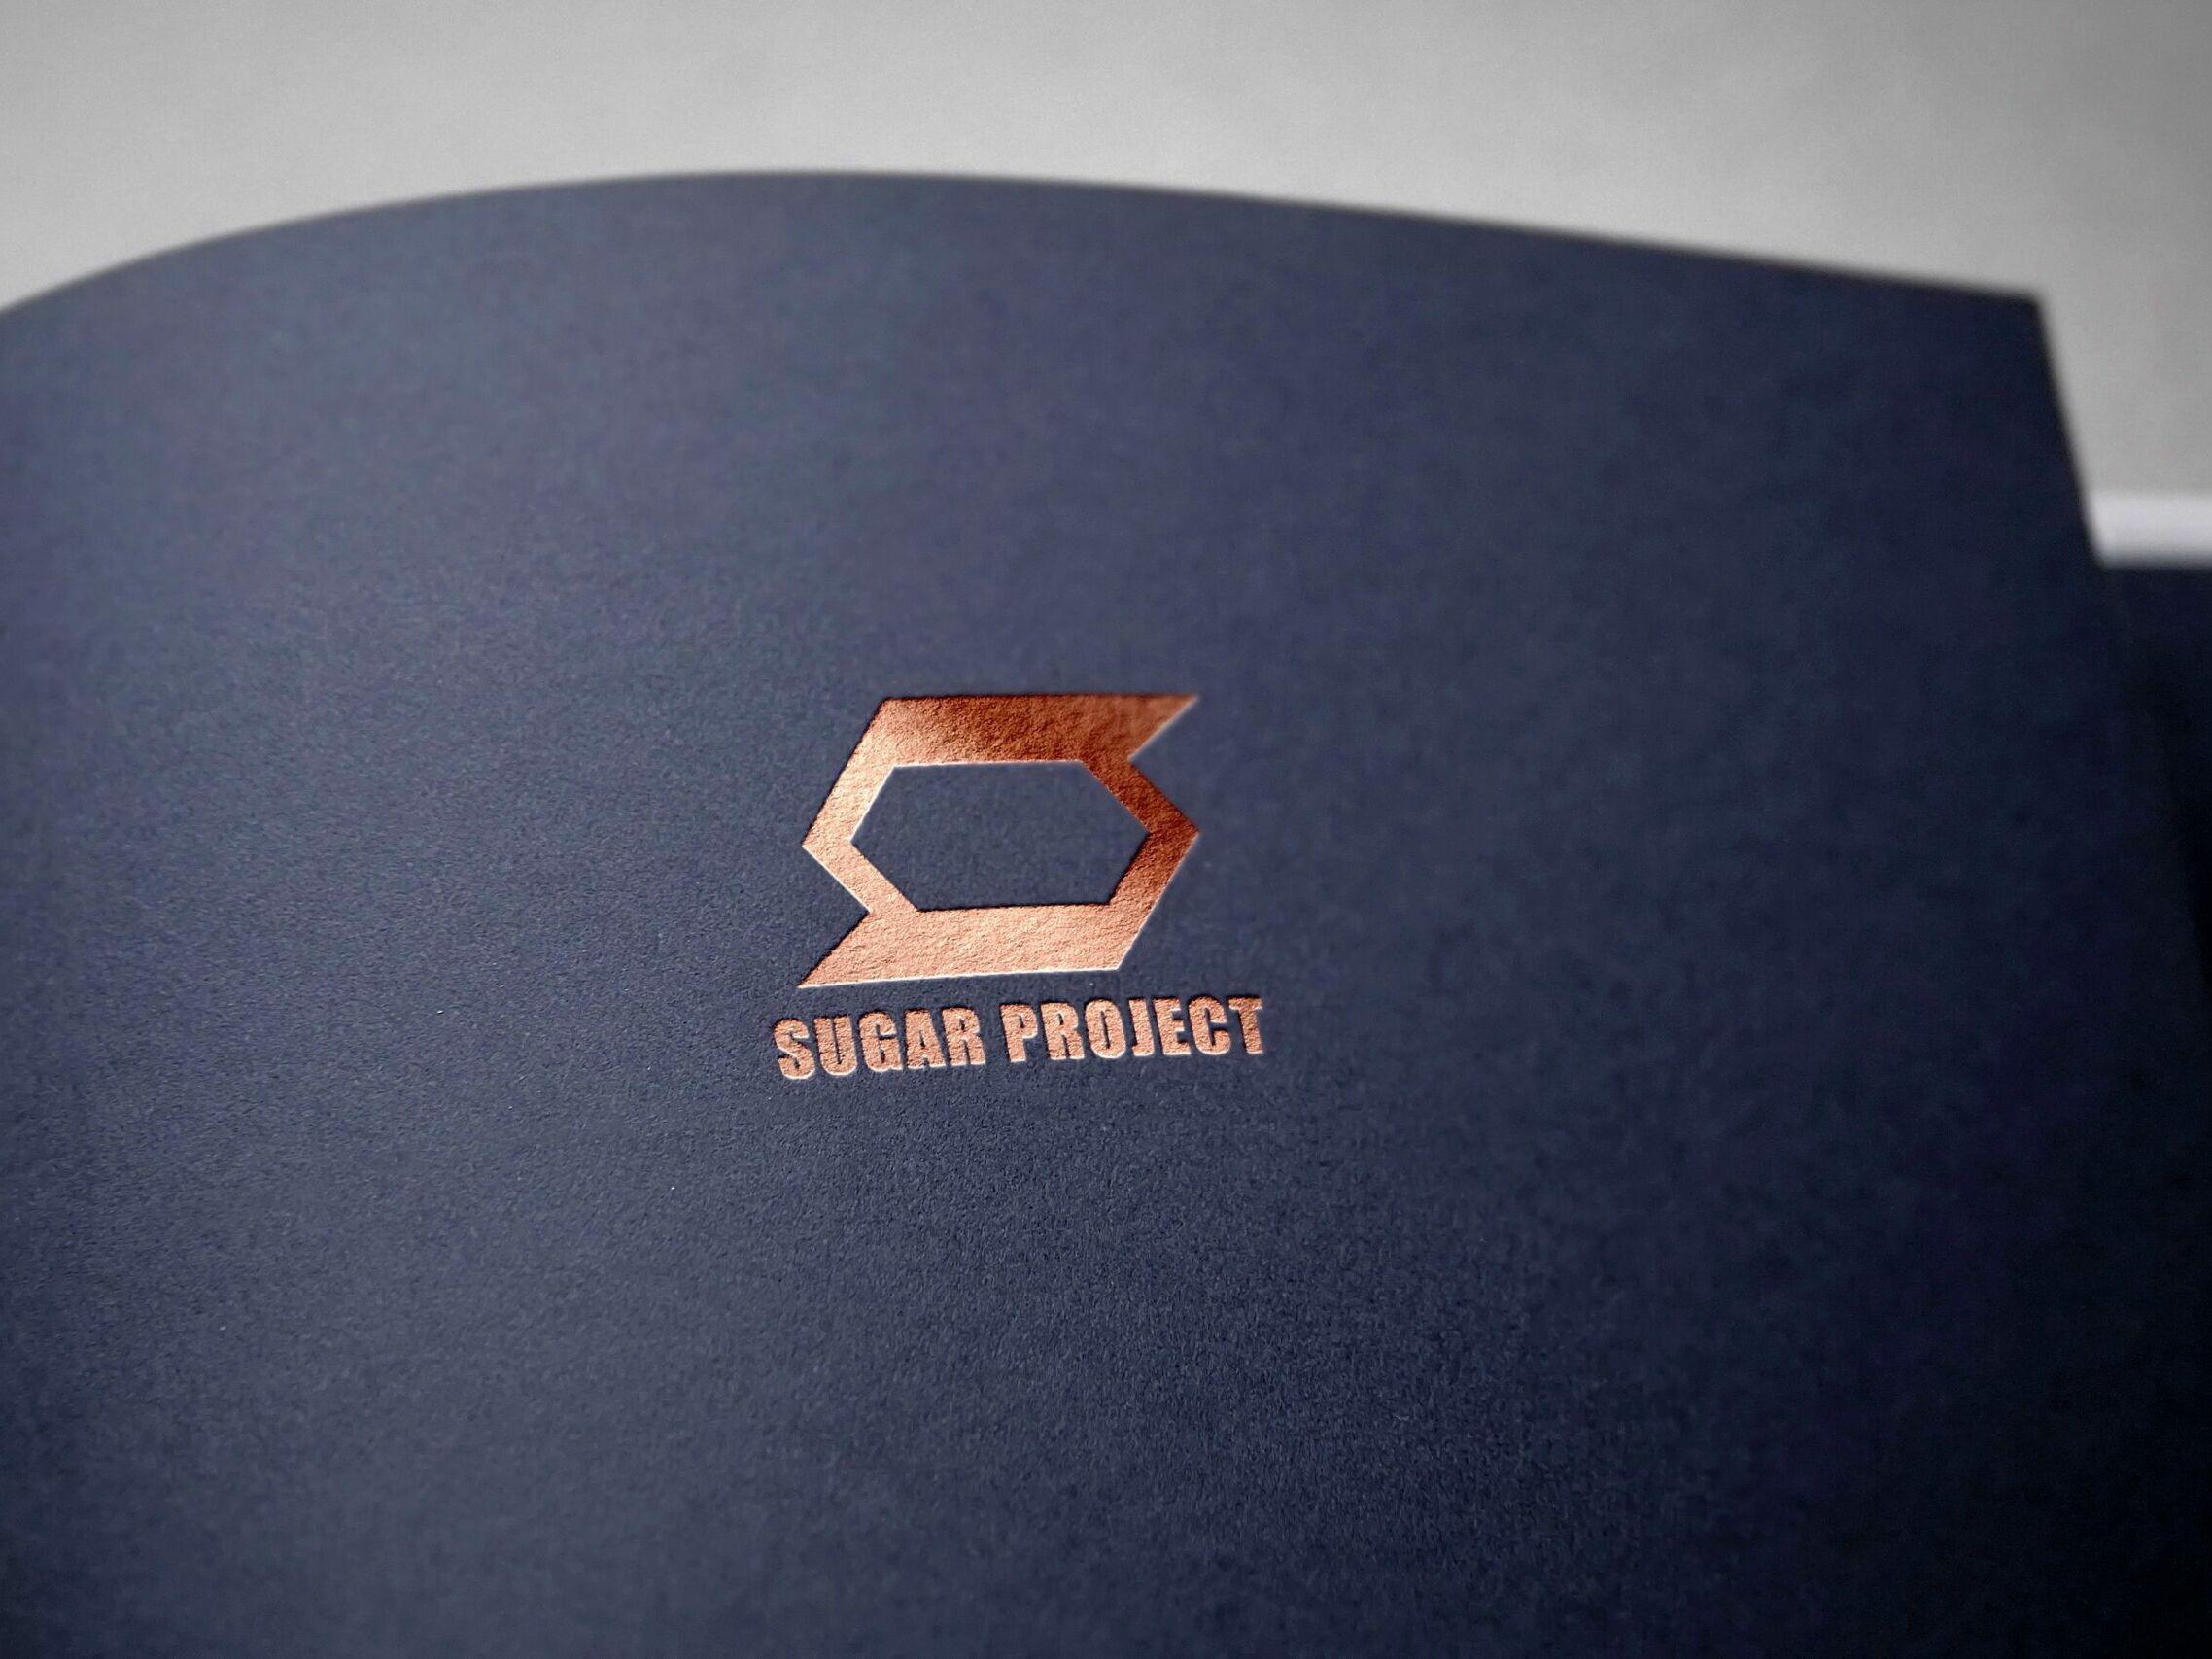 Sugar Project Mockup 01 Perfectlyclear